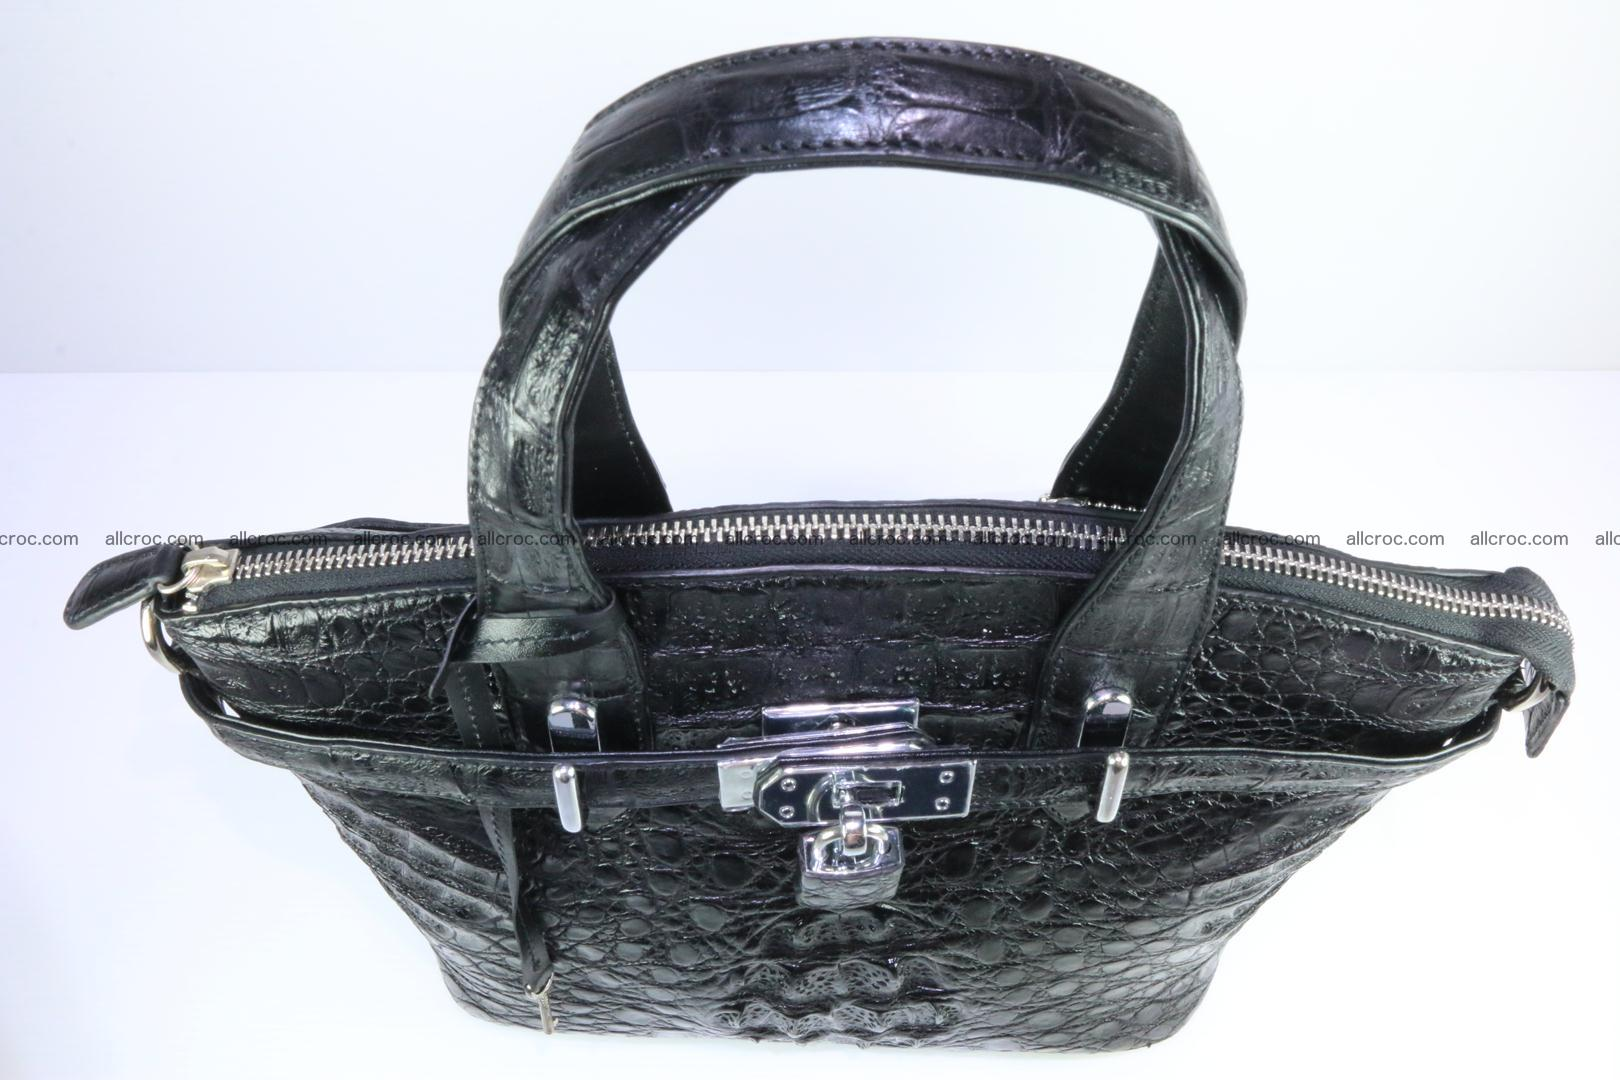 Genuine crocodile handbag for ladies 051 Foto 6